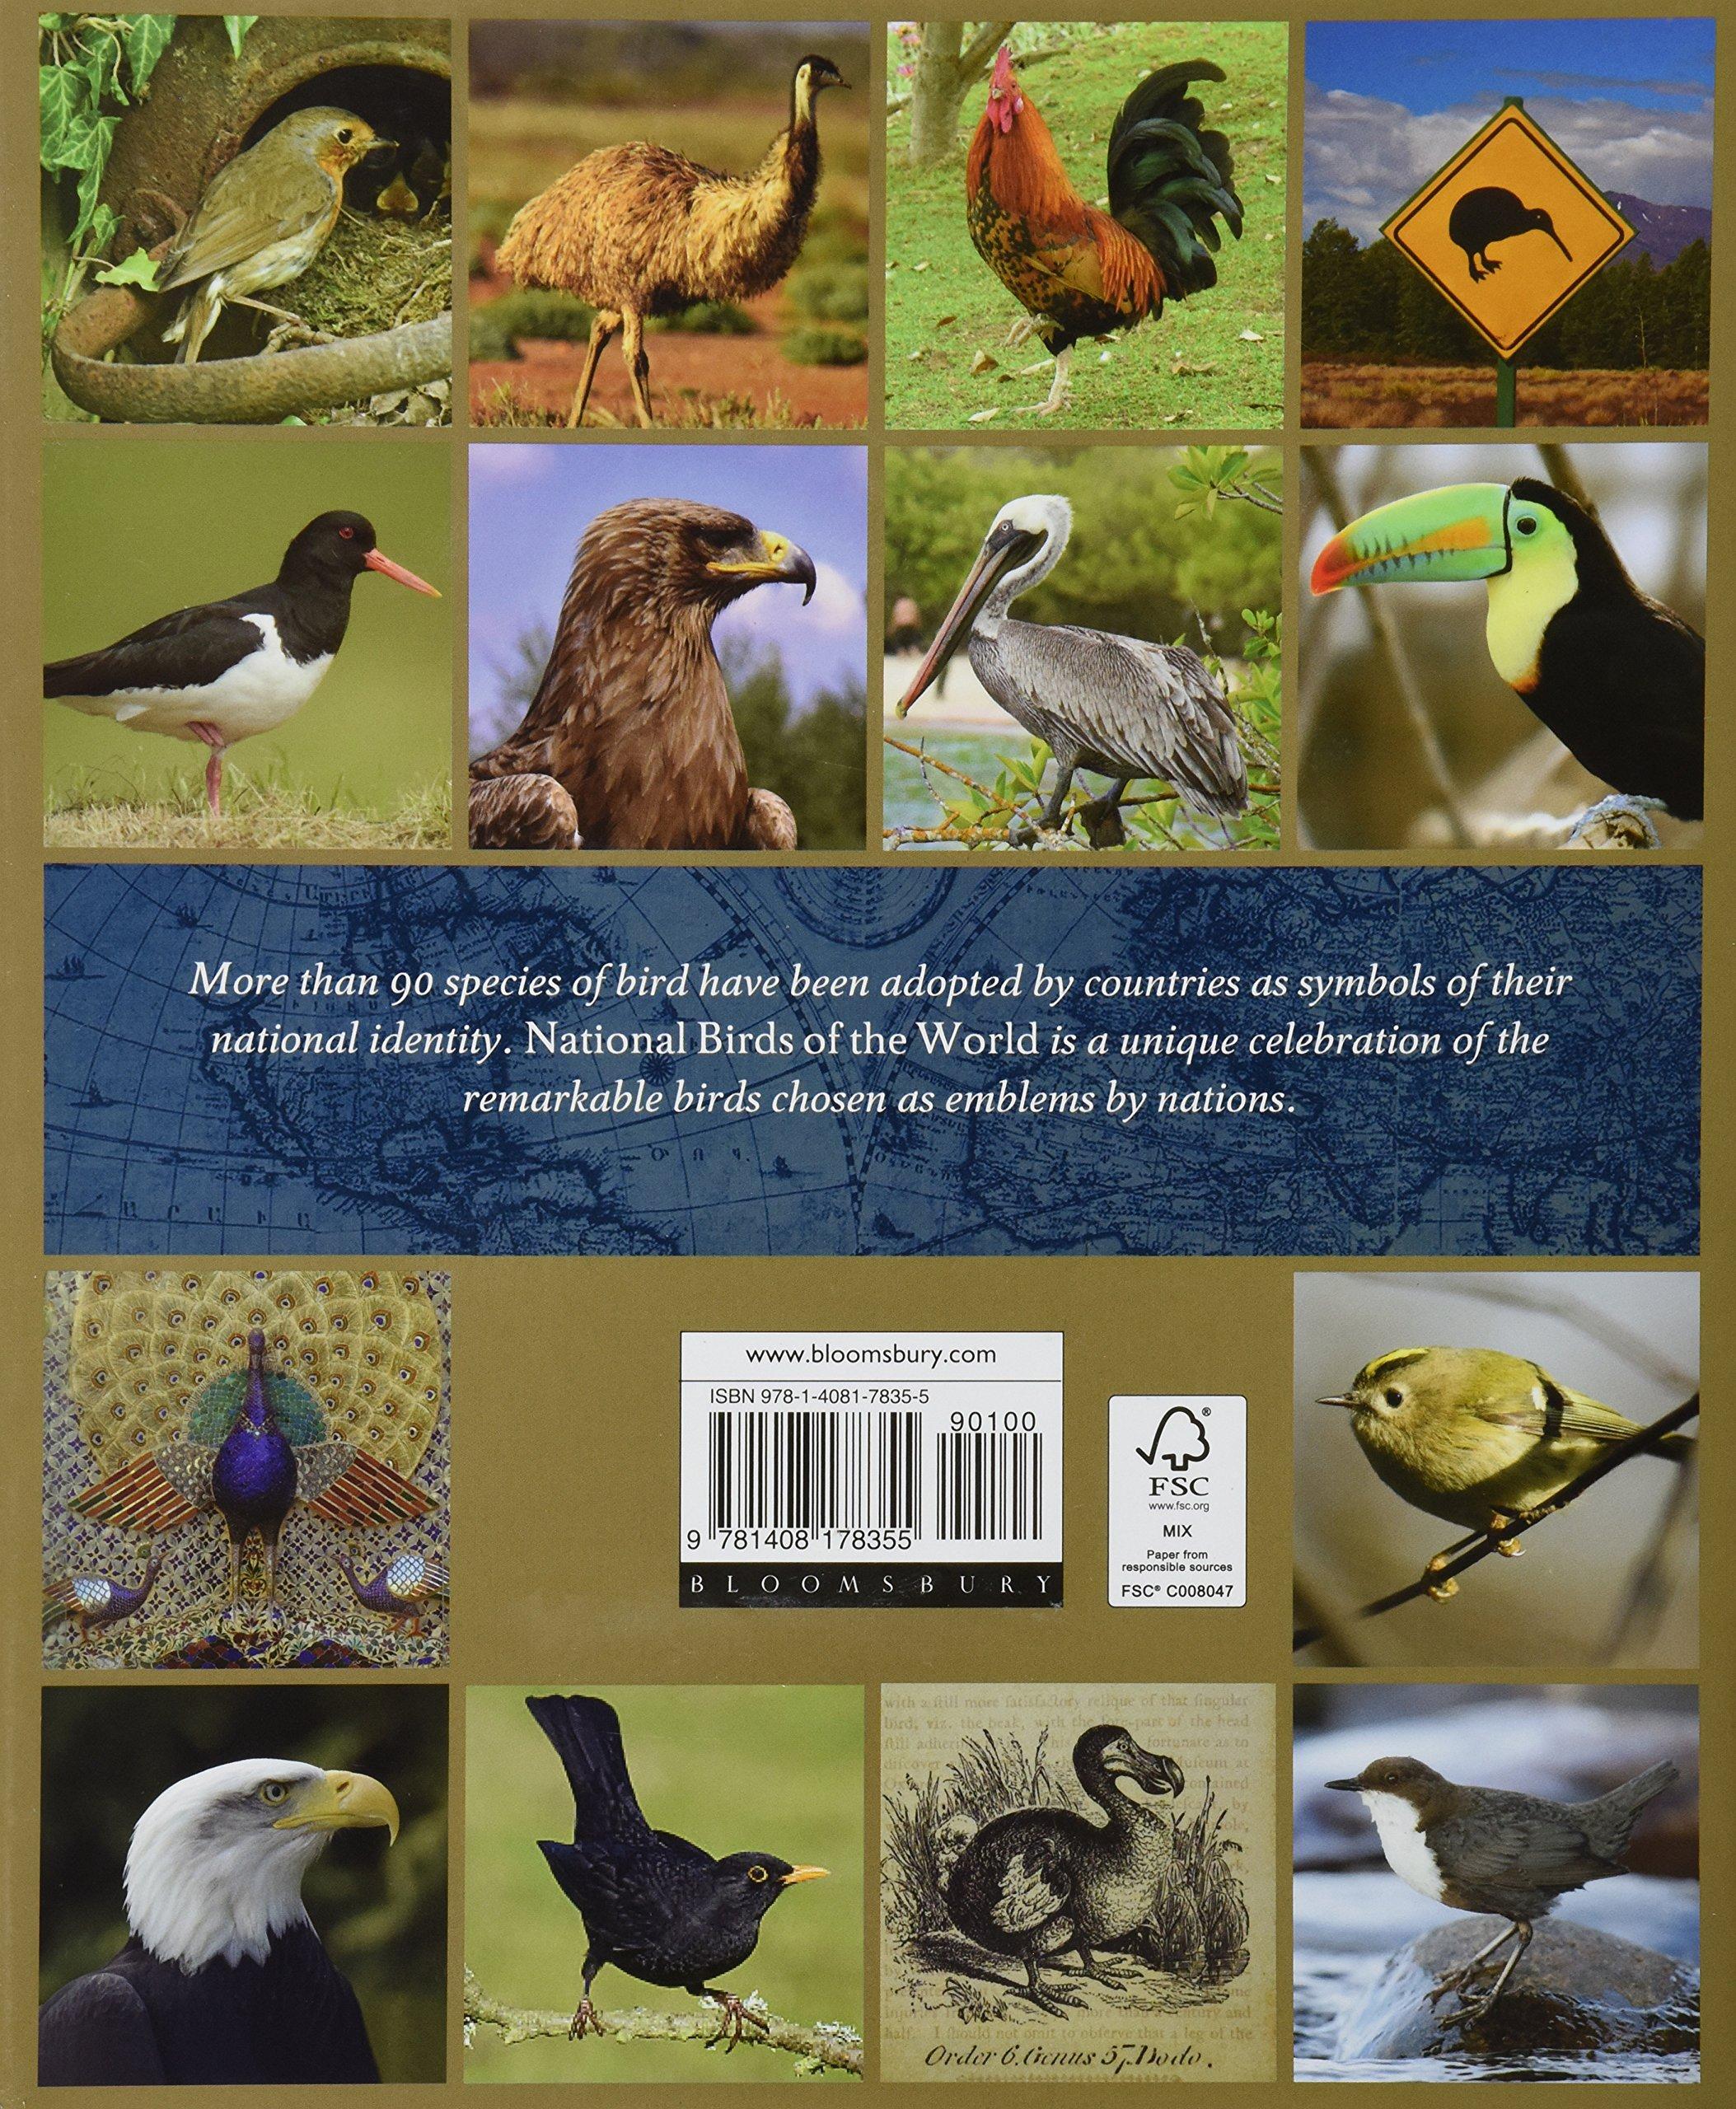 National Birds Of The World Ron Toft 9781408178355 Amazon Books